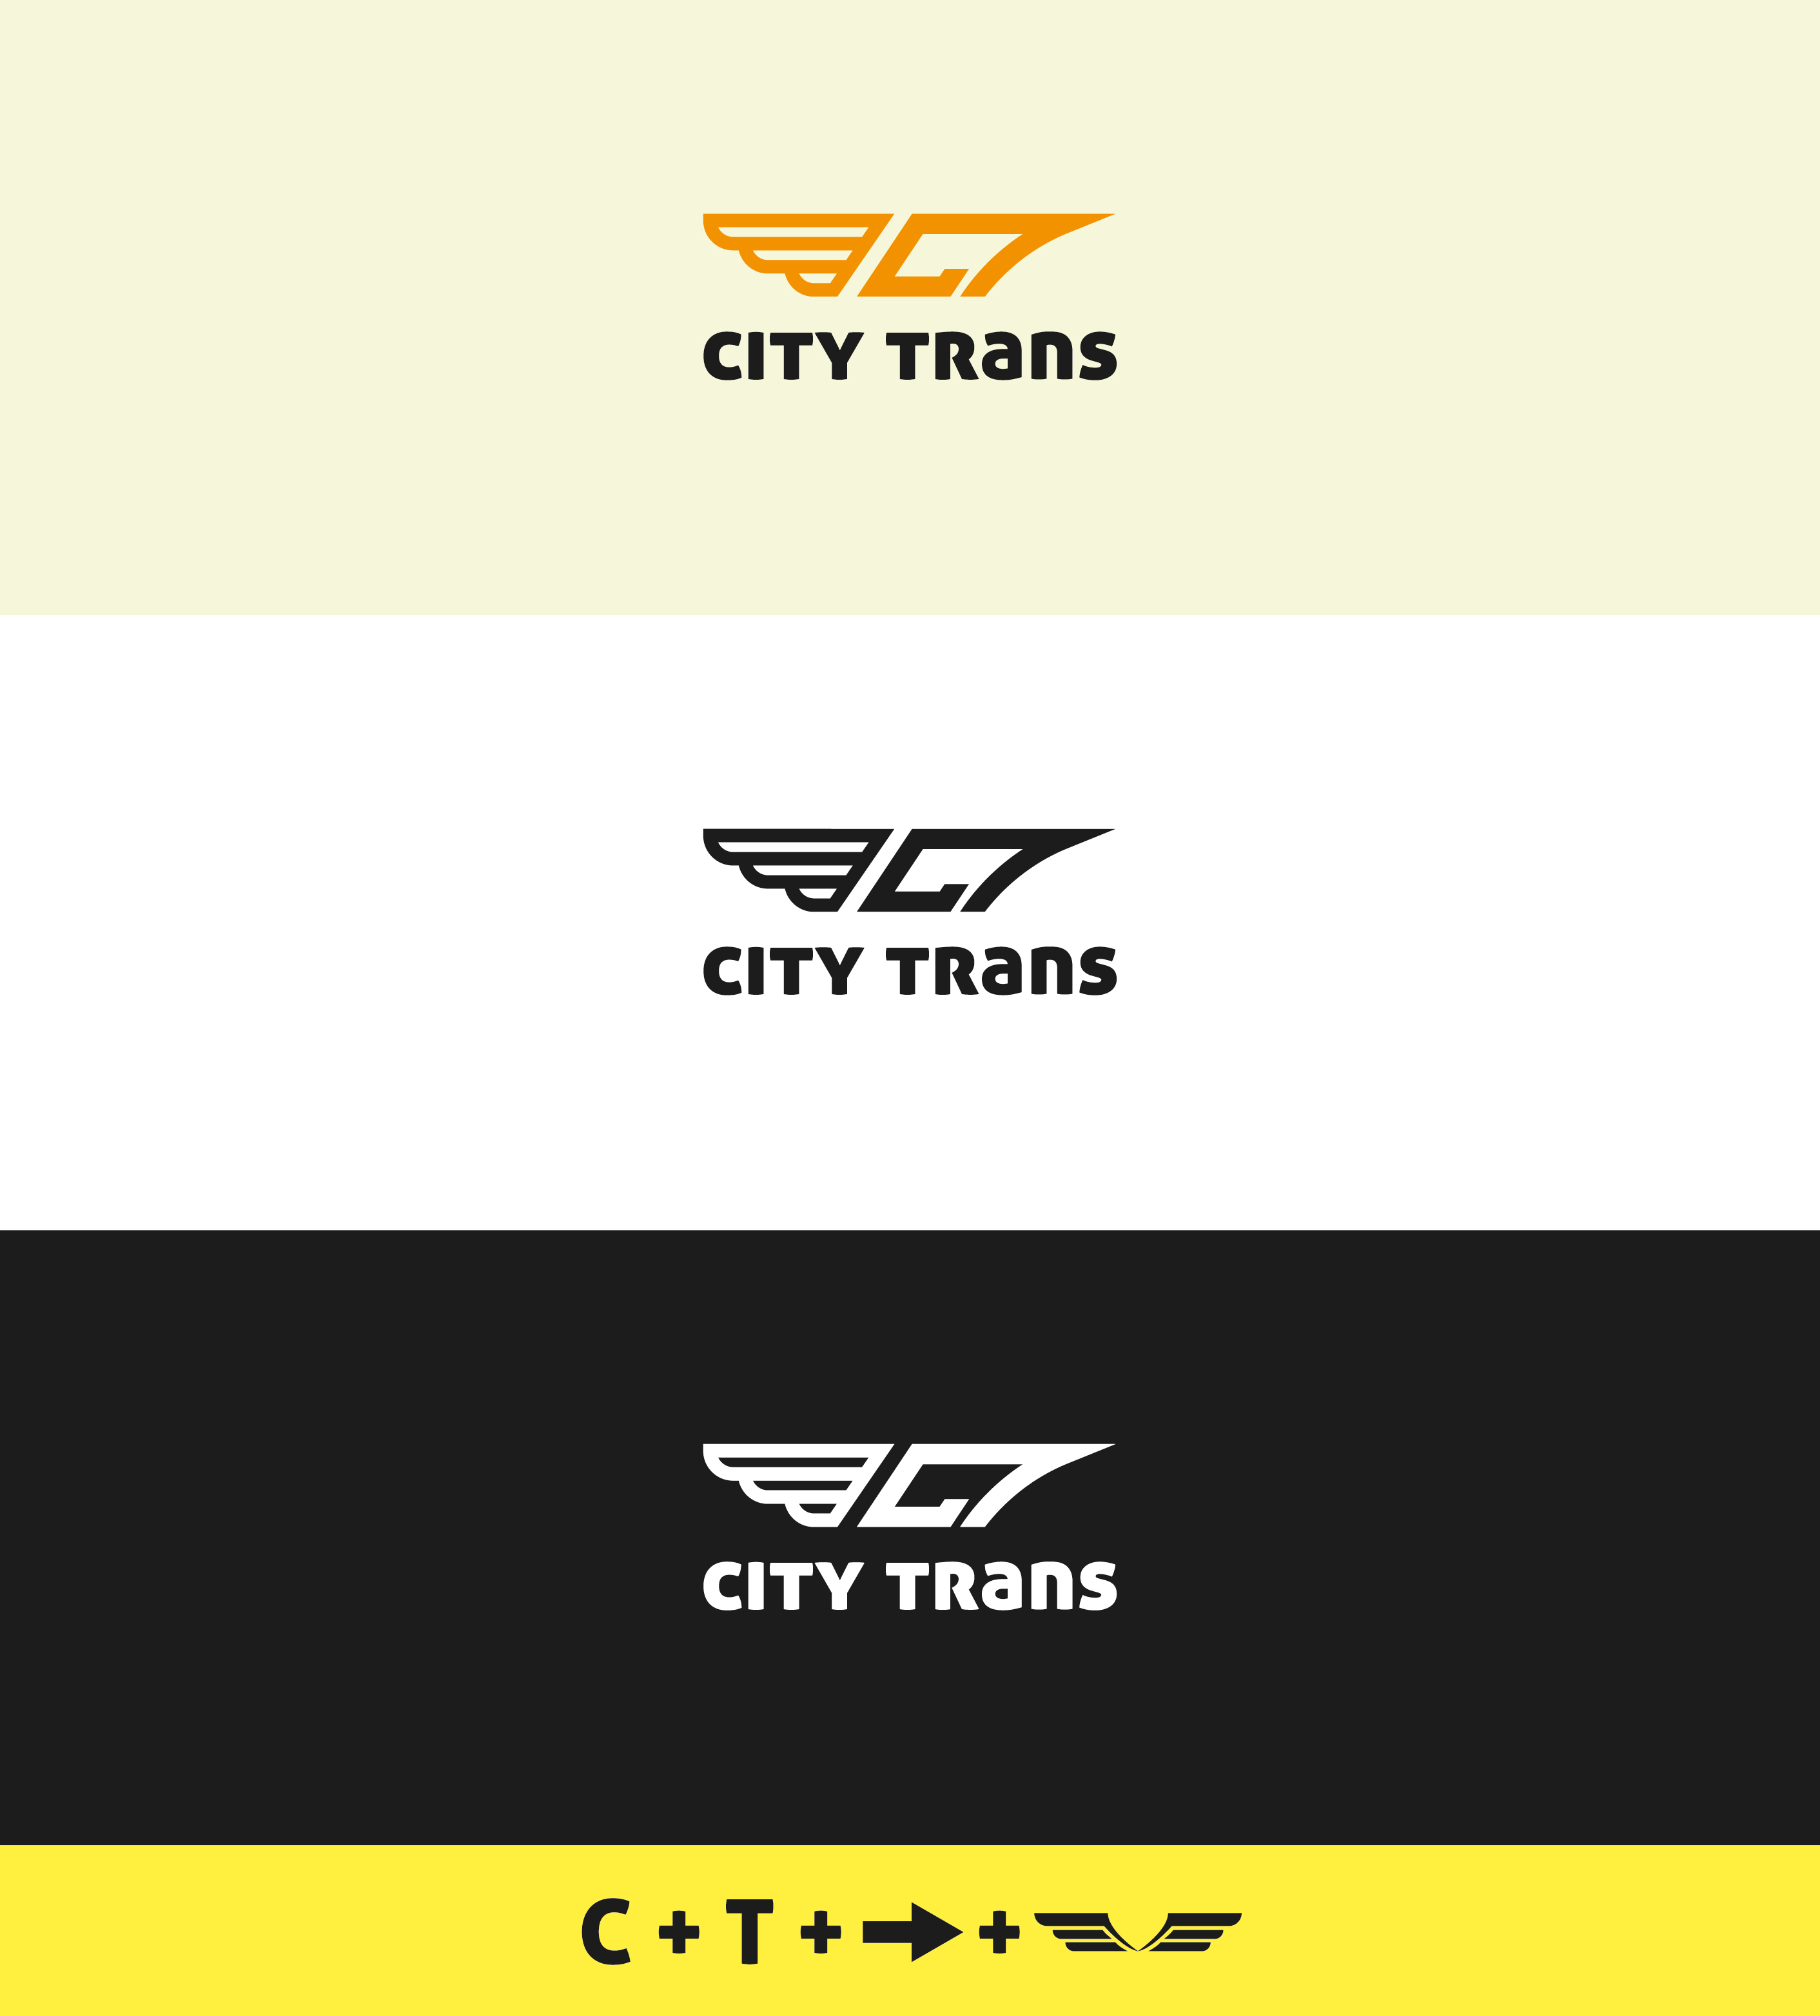 Разработка Логотипа транспортной компании фото f_6745e6fabf9daacb.jpg